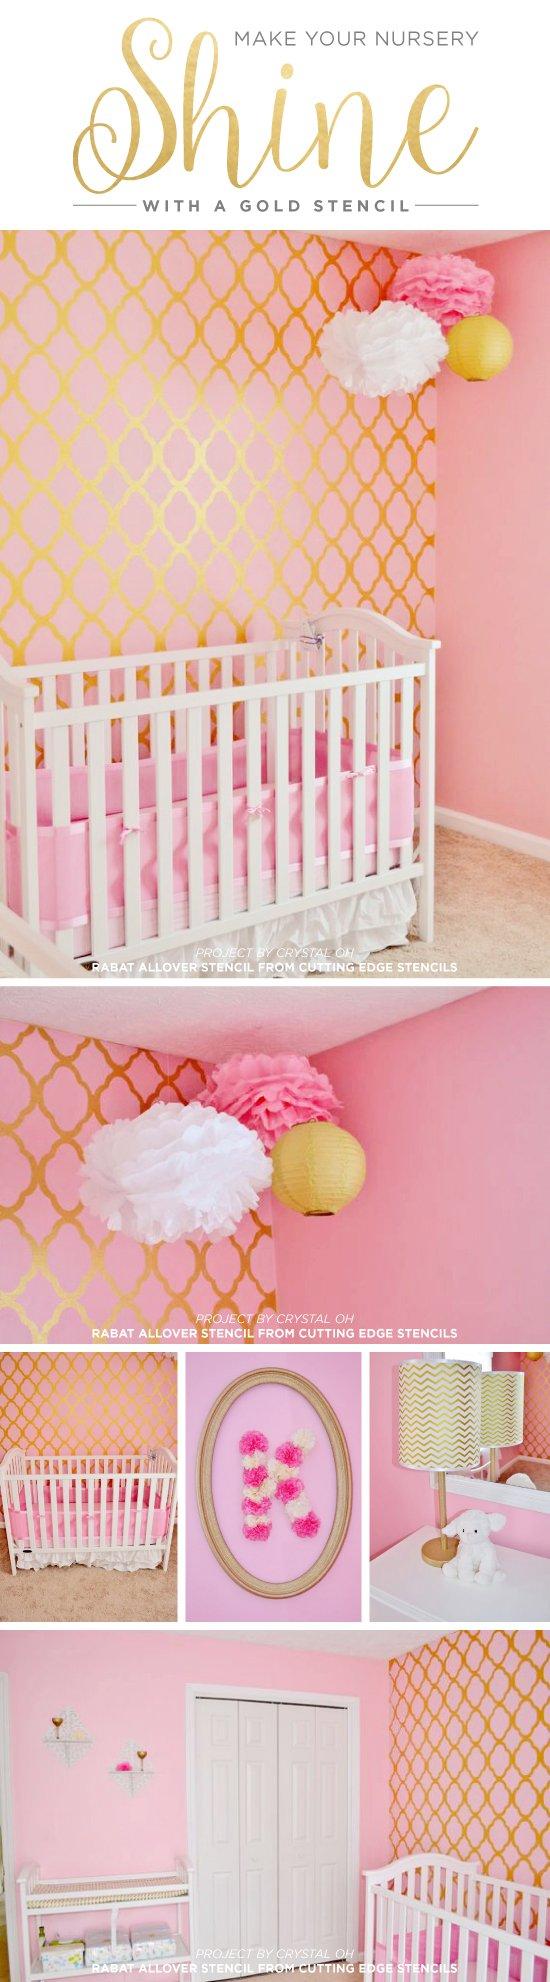 A DIY stenciled pink and gold nursery using the Rabat Allover Stencil from Cutting Edge Stencils. http://www.cuttingedgestencils.com/moroccan-stencil-pattern-3.html